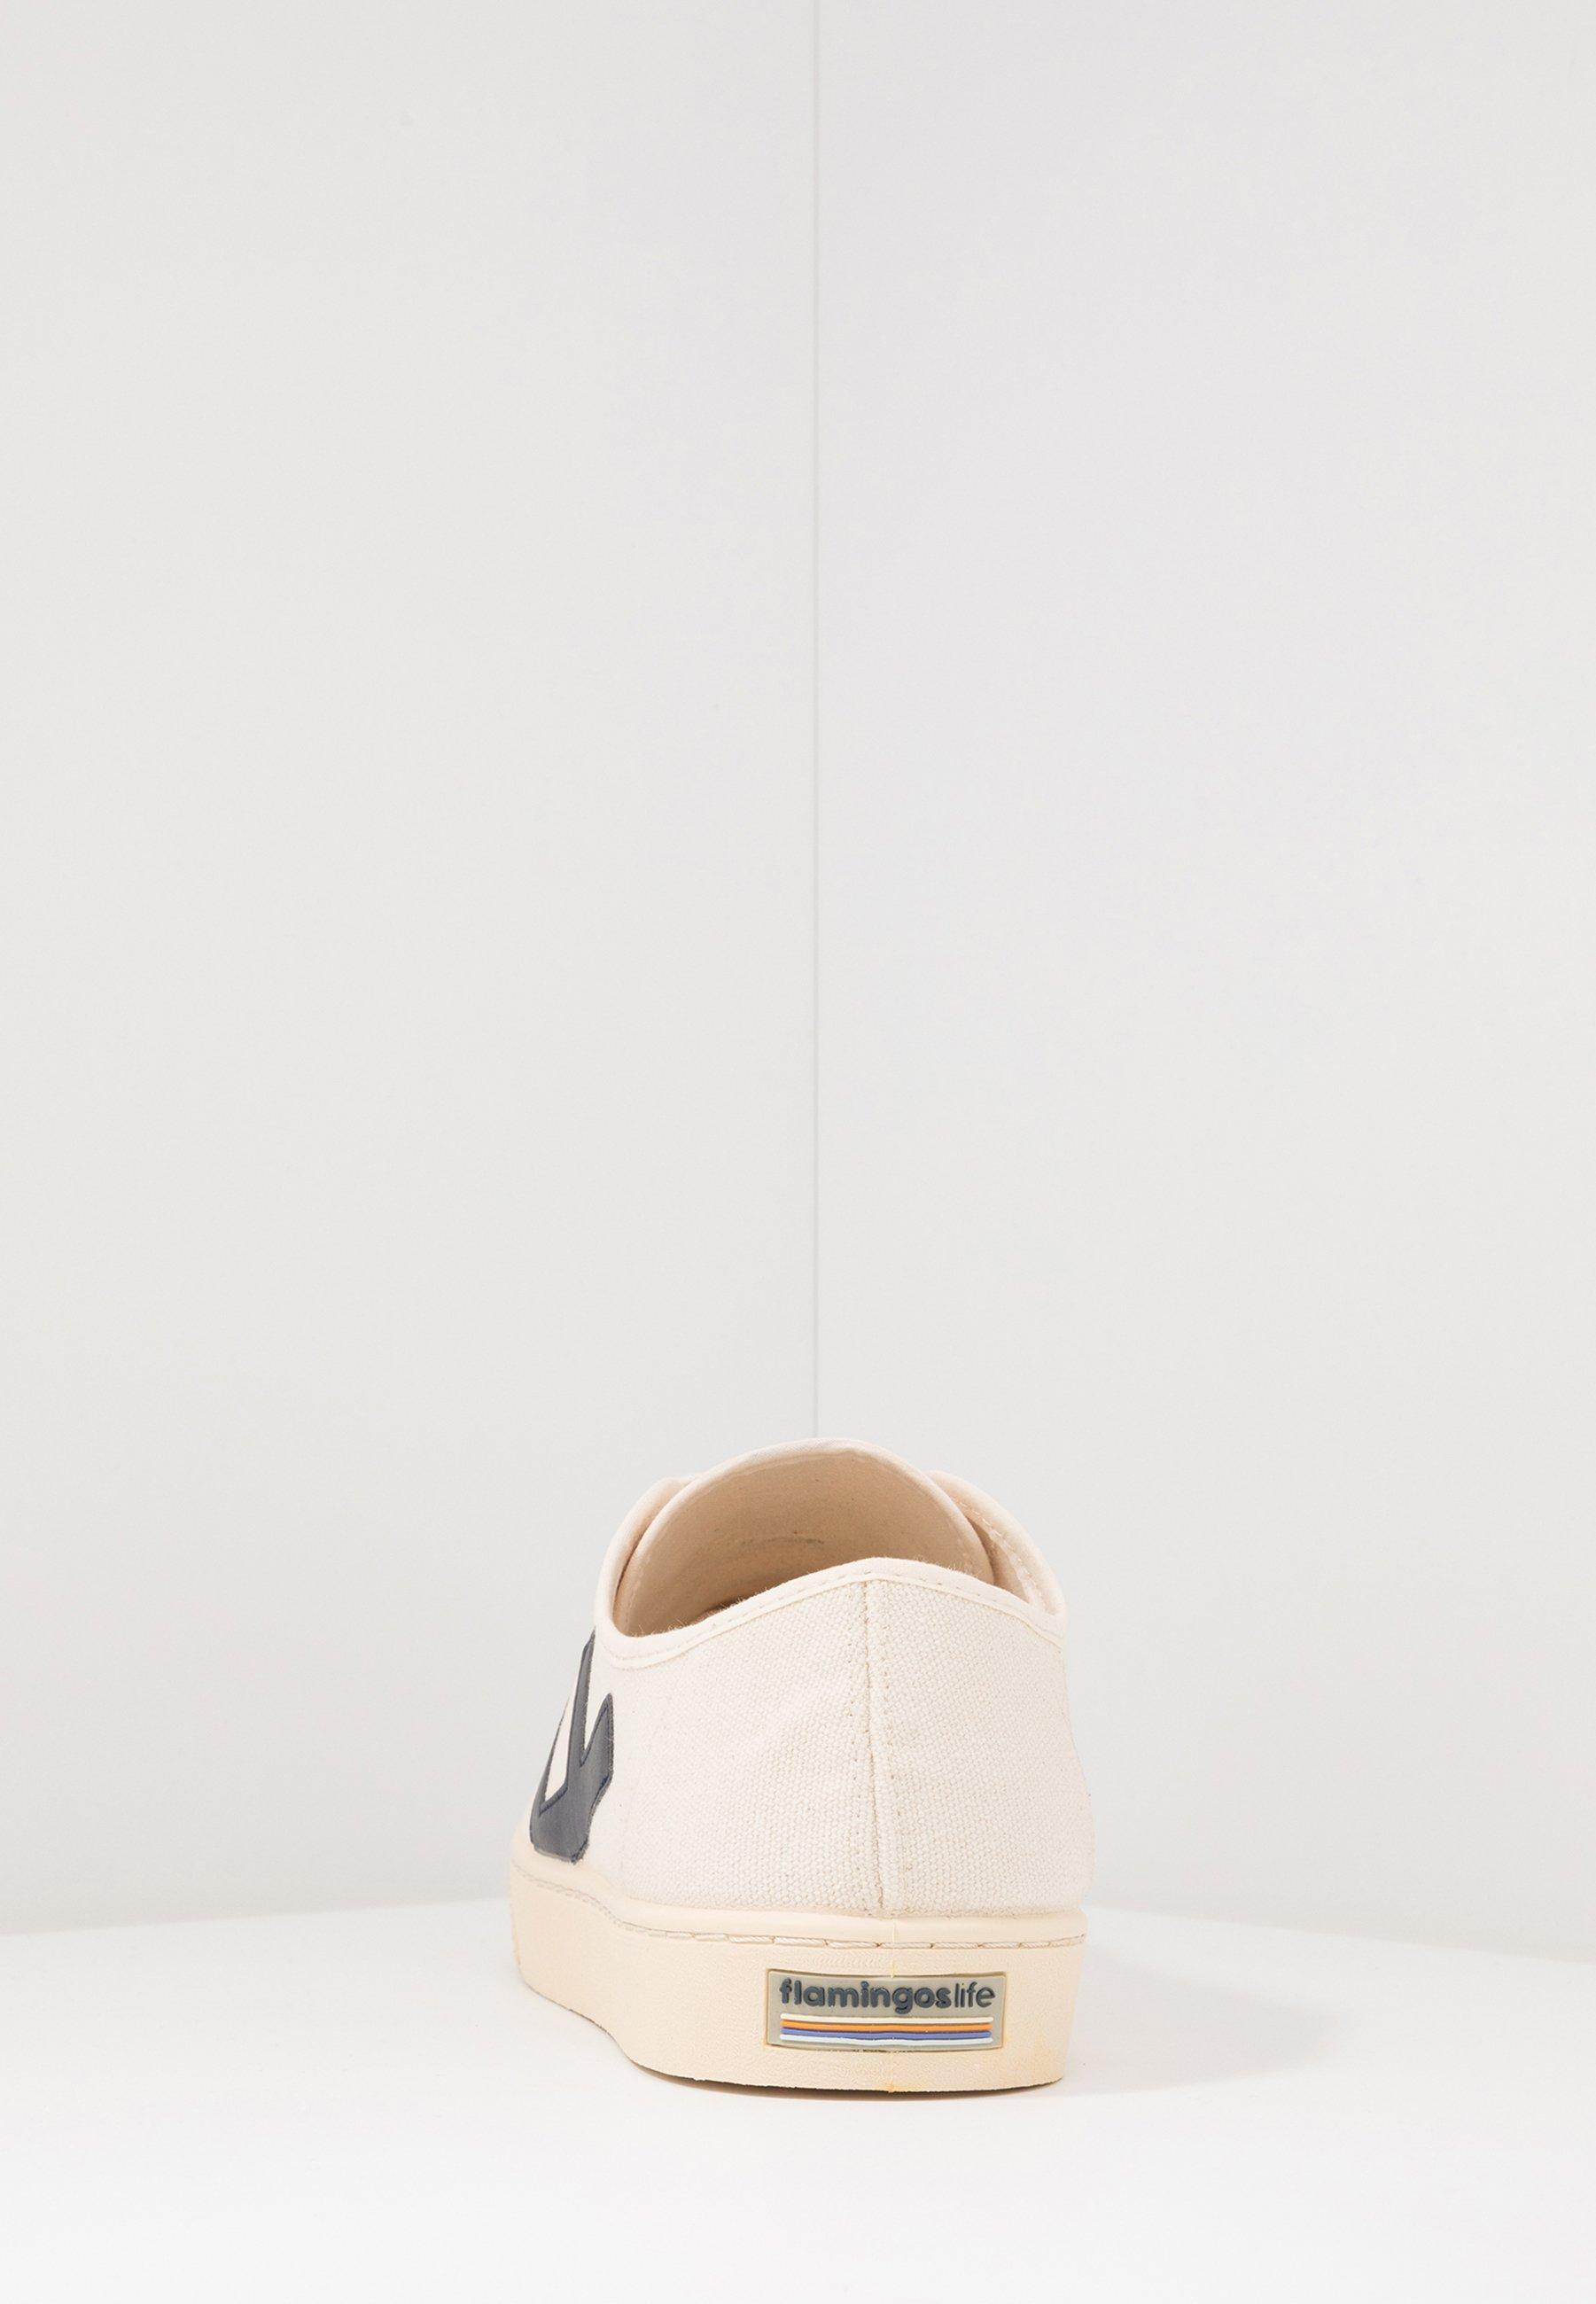 Flamingos' Life Rancho - Sneakers Beige/navy/ivory